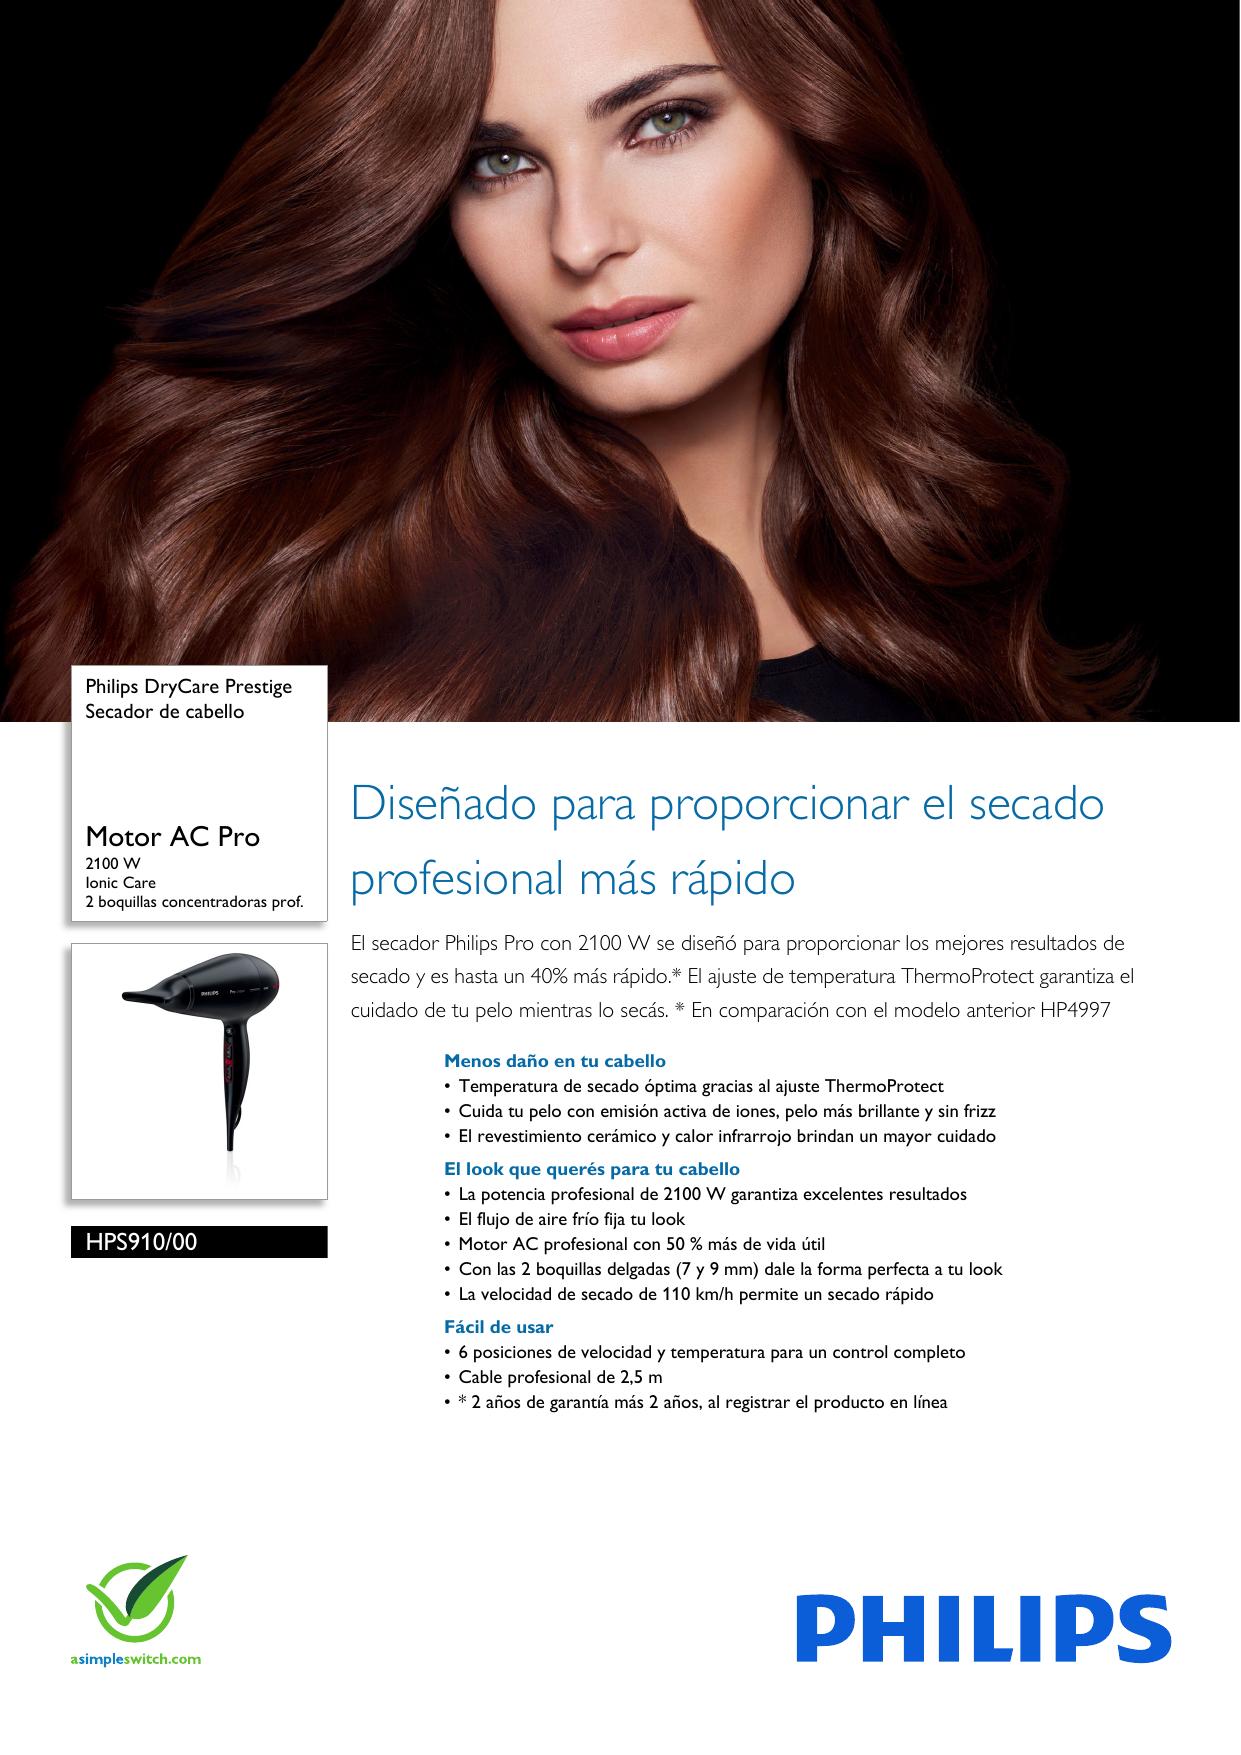 Philips HPS910 00 Leaflet HPS910 00 Released Argentina (Spanish) User  Manual Folleto Hps910 00 Pss Aspar 0dd5f72056ec